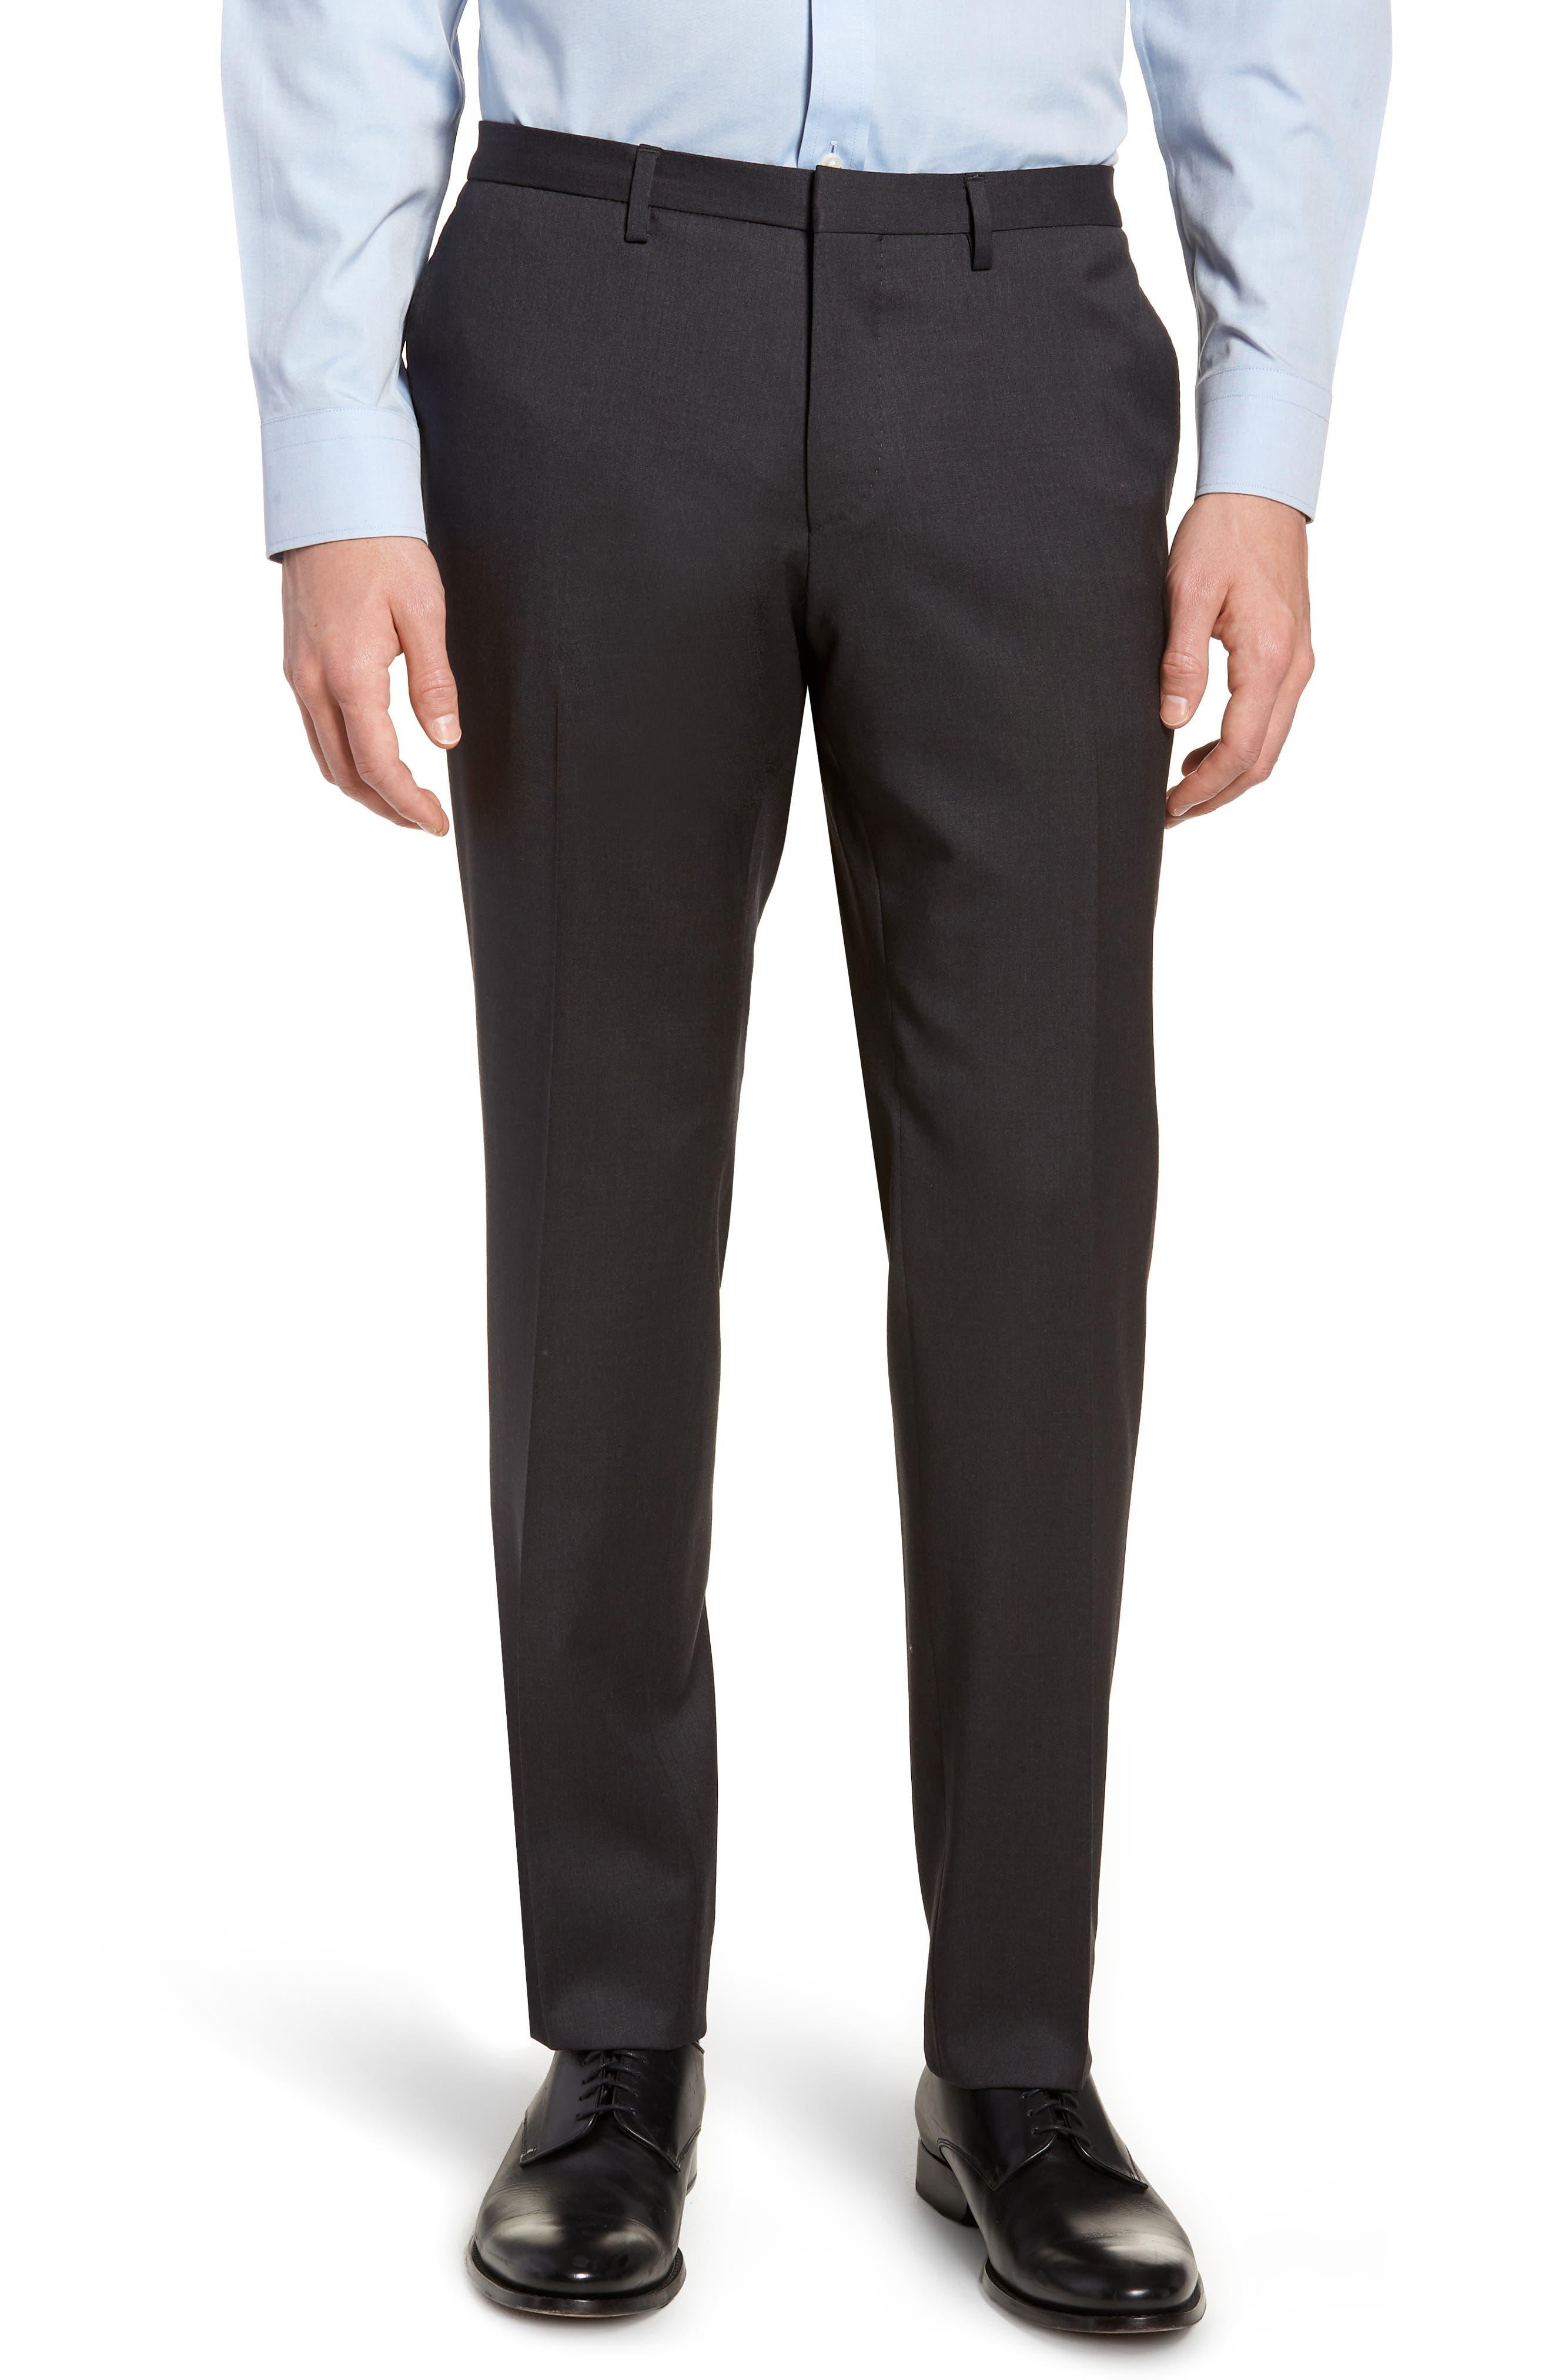 'Ryan/Win' Extra Trim Fit Solid Wool Suit,                             Alternate thumbnail 8, color,                             Dark Grey